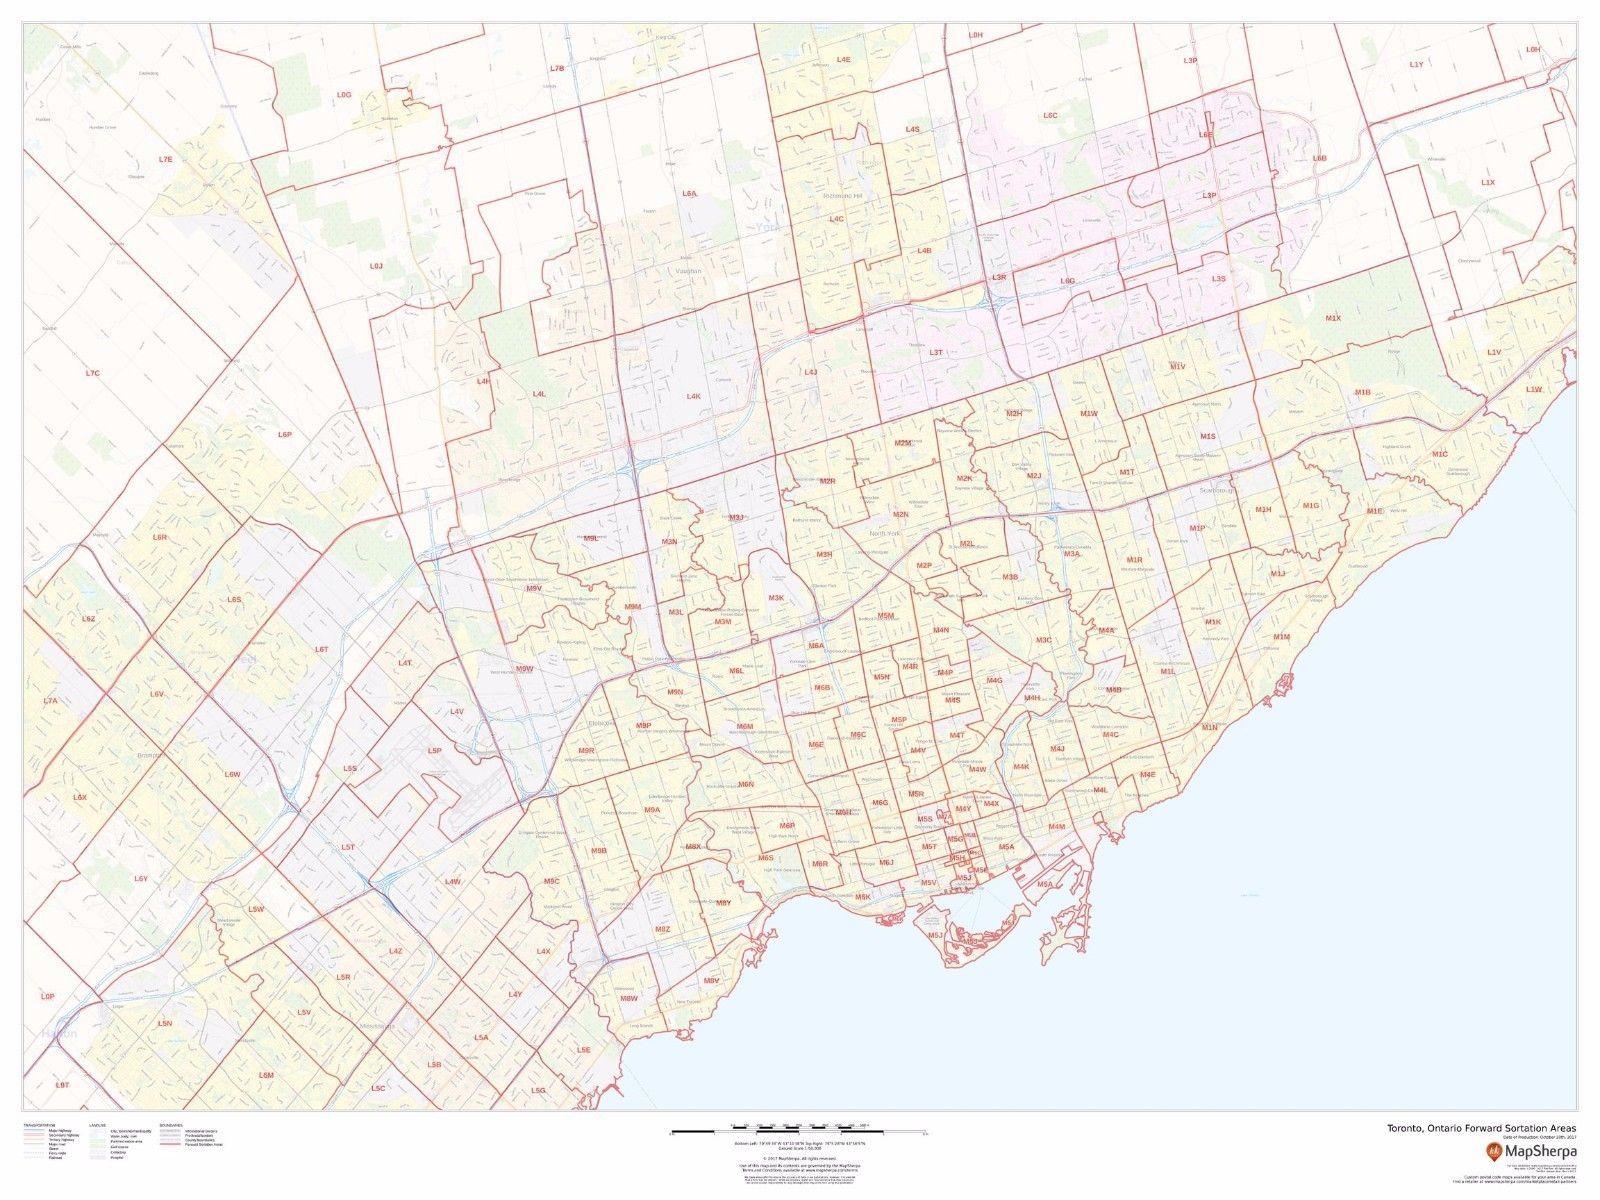 Toronto Ontario Postal Code FSA Laminated And 45 Similar